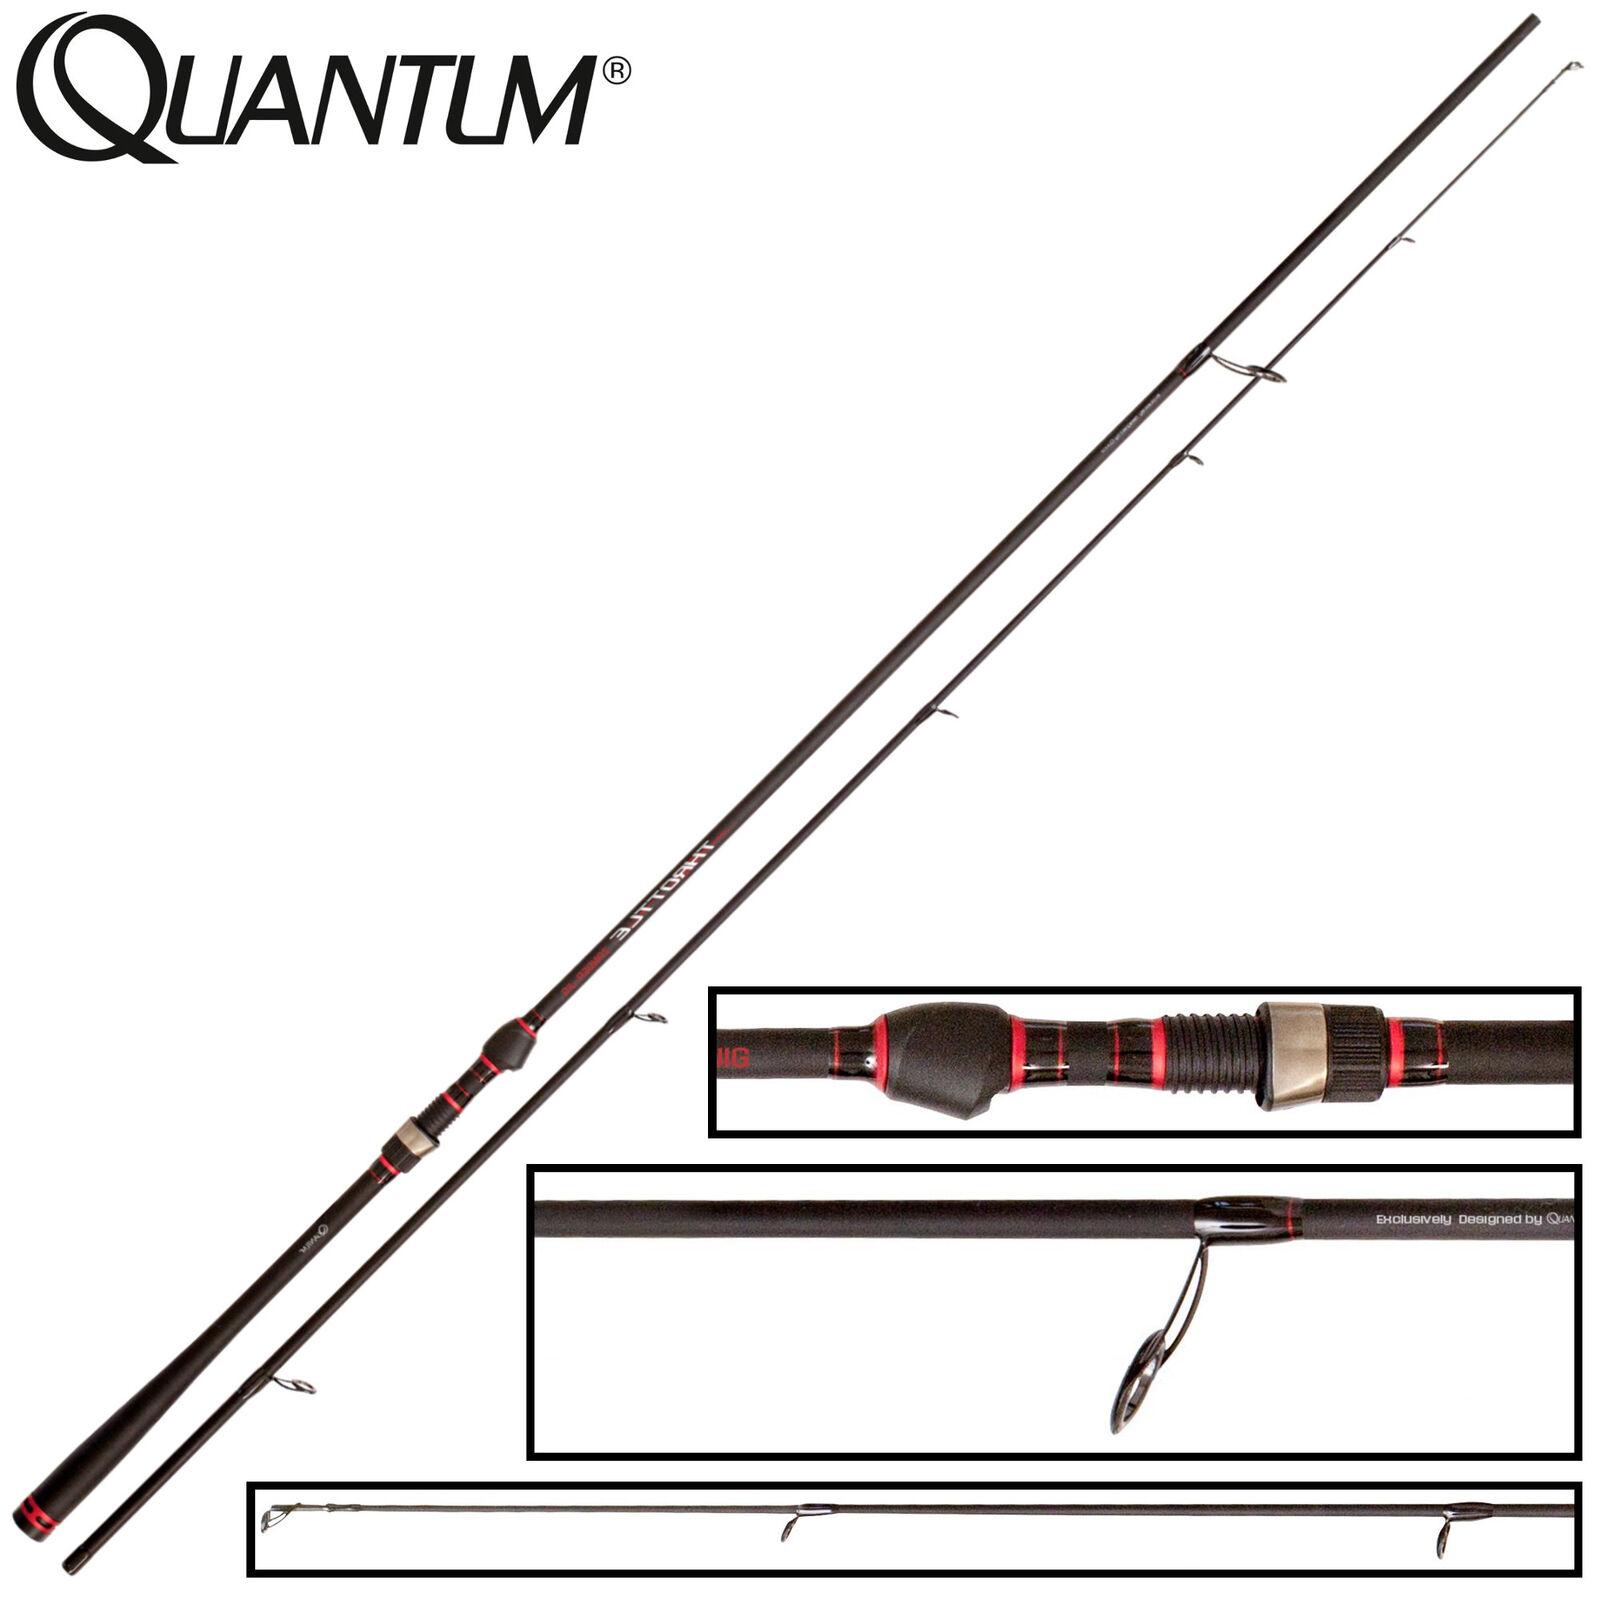 Quantum Throttle Zander Jig 2 65m 10-60g - Spinnrute Zanderrute Angelrute